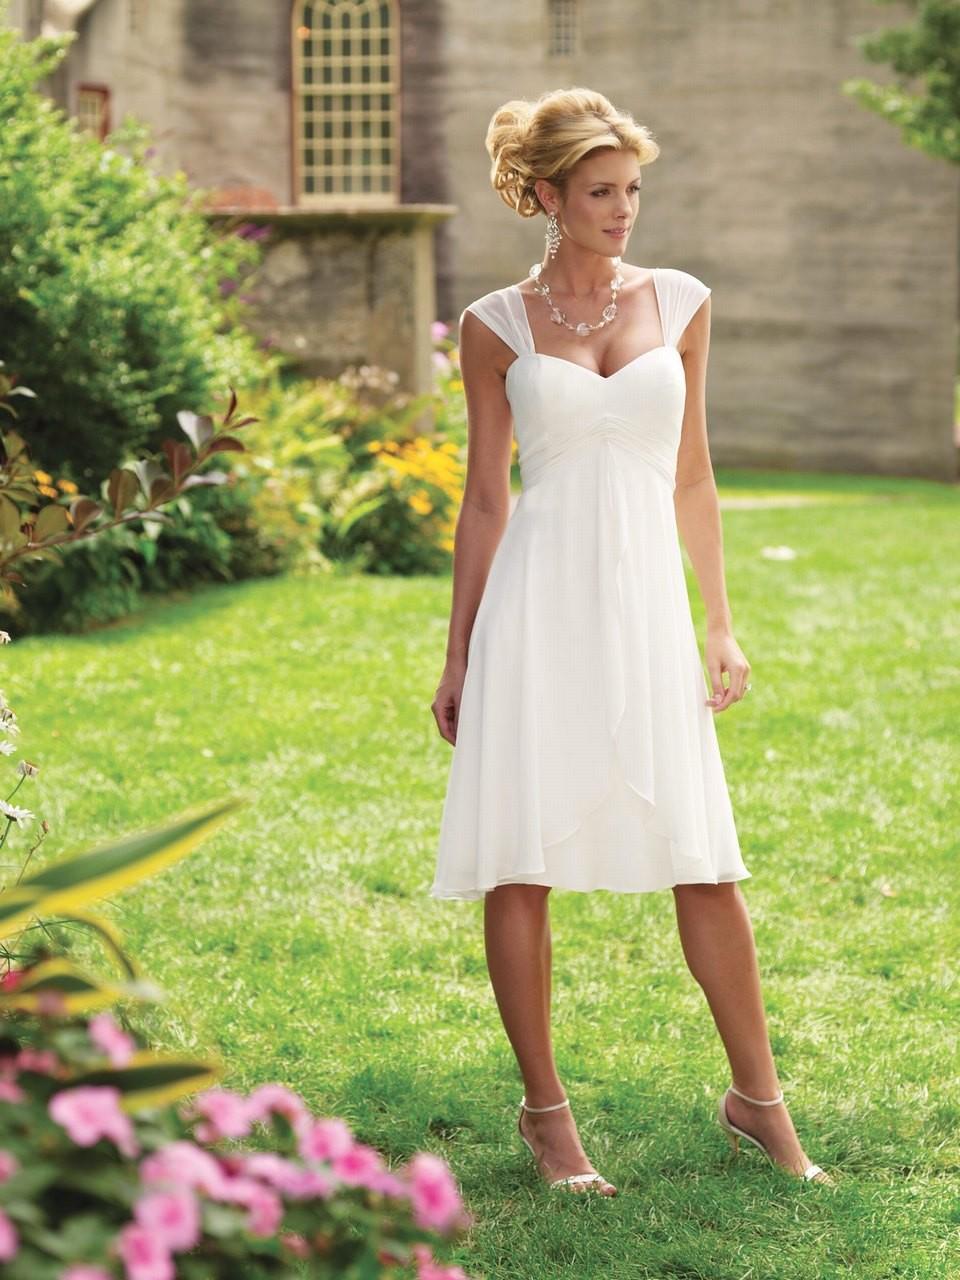 peach knee length bridesmaid dresses uk short summer wedding dresses Navy Knee Length Bridesmaid Dresses Uk Wedding